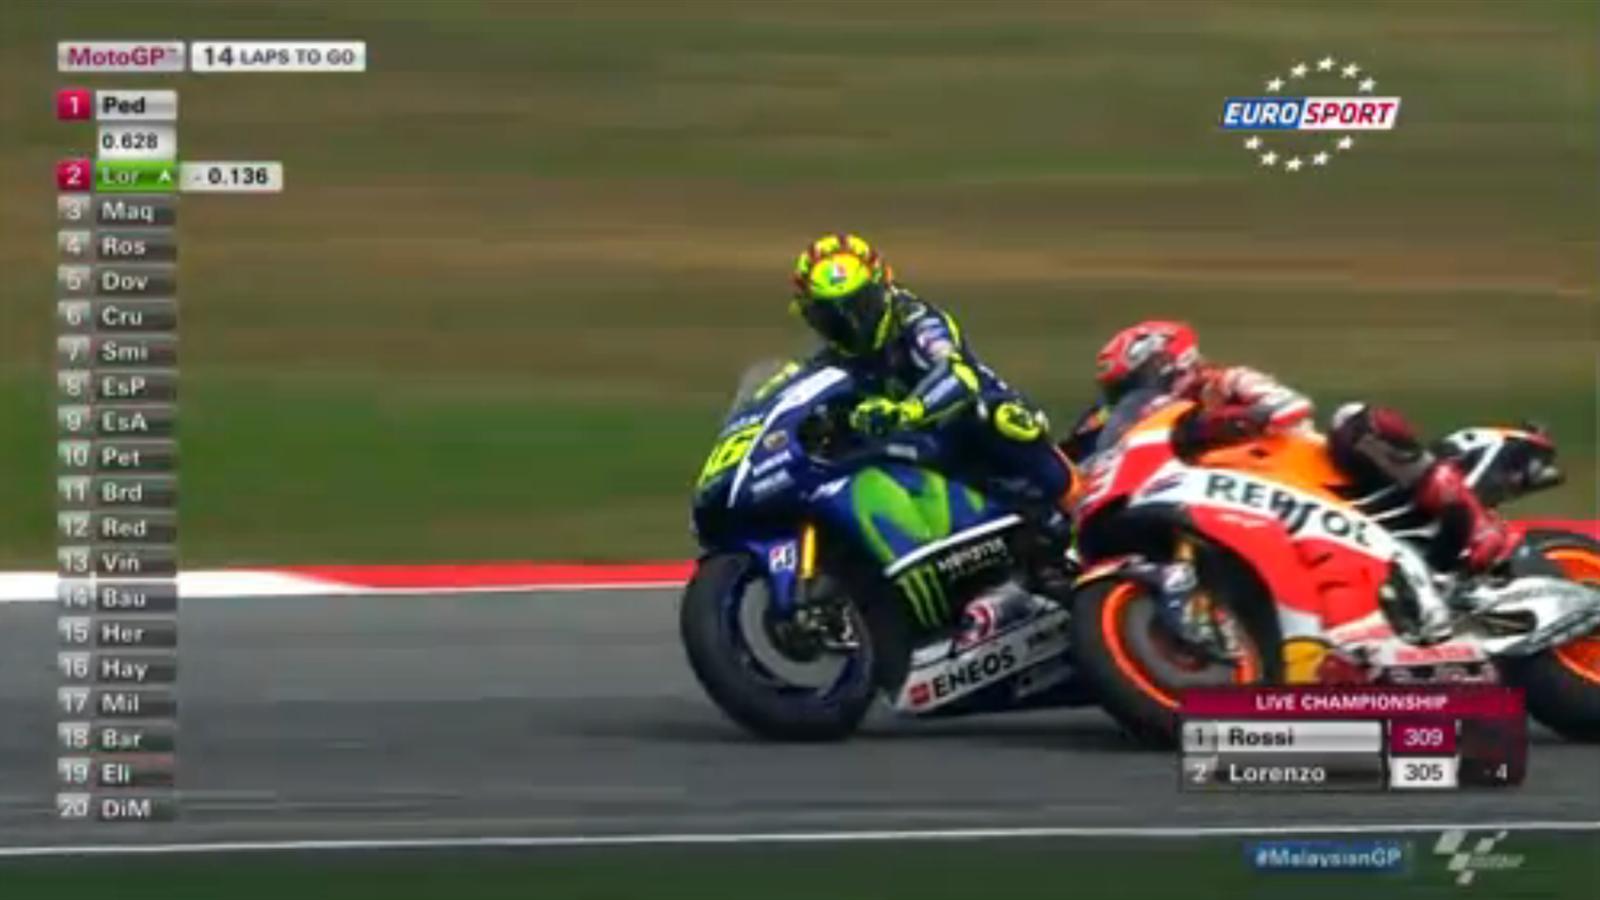 Rossi and Marquez clash (screeshot) - Malaysian GP 2015